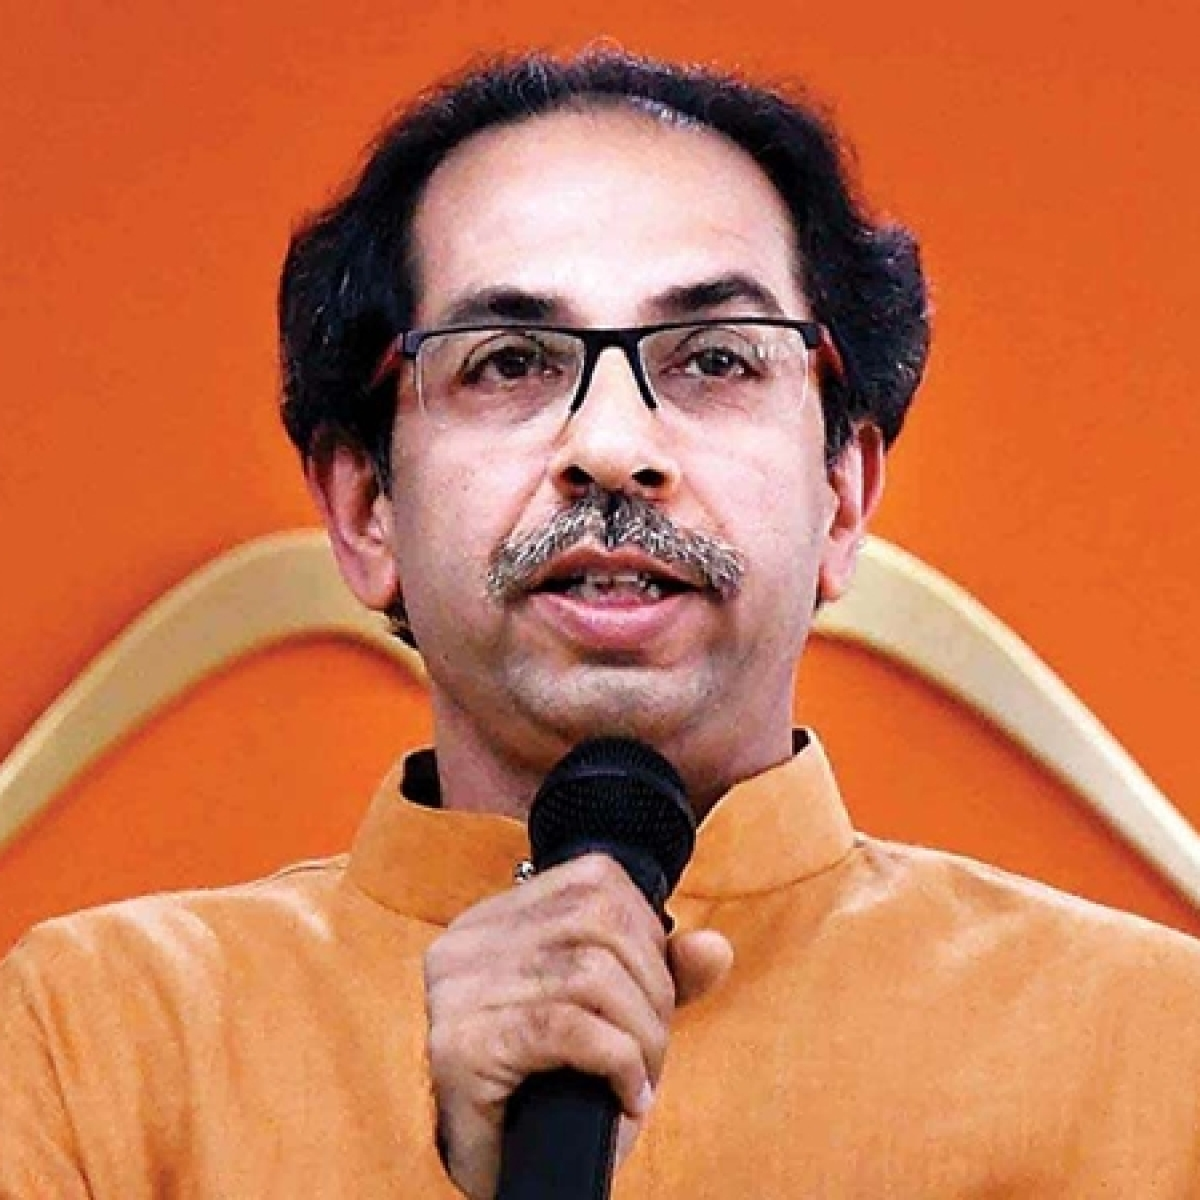 Uddhav Thackeray tries to strike balance, but allies don't